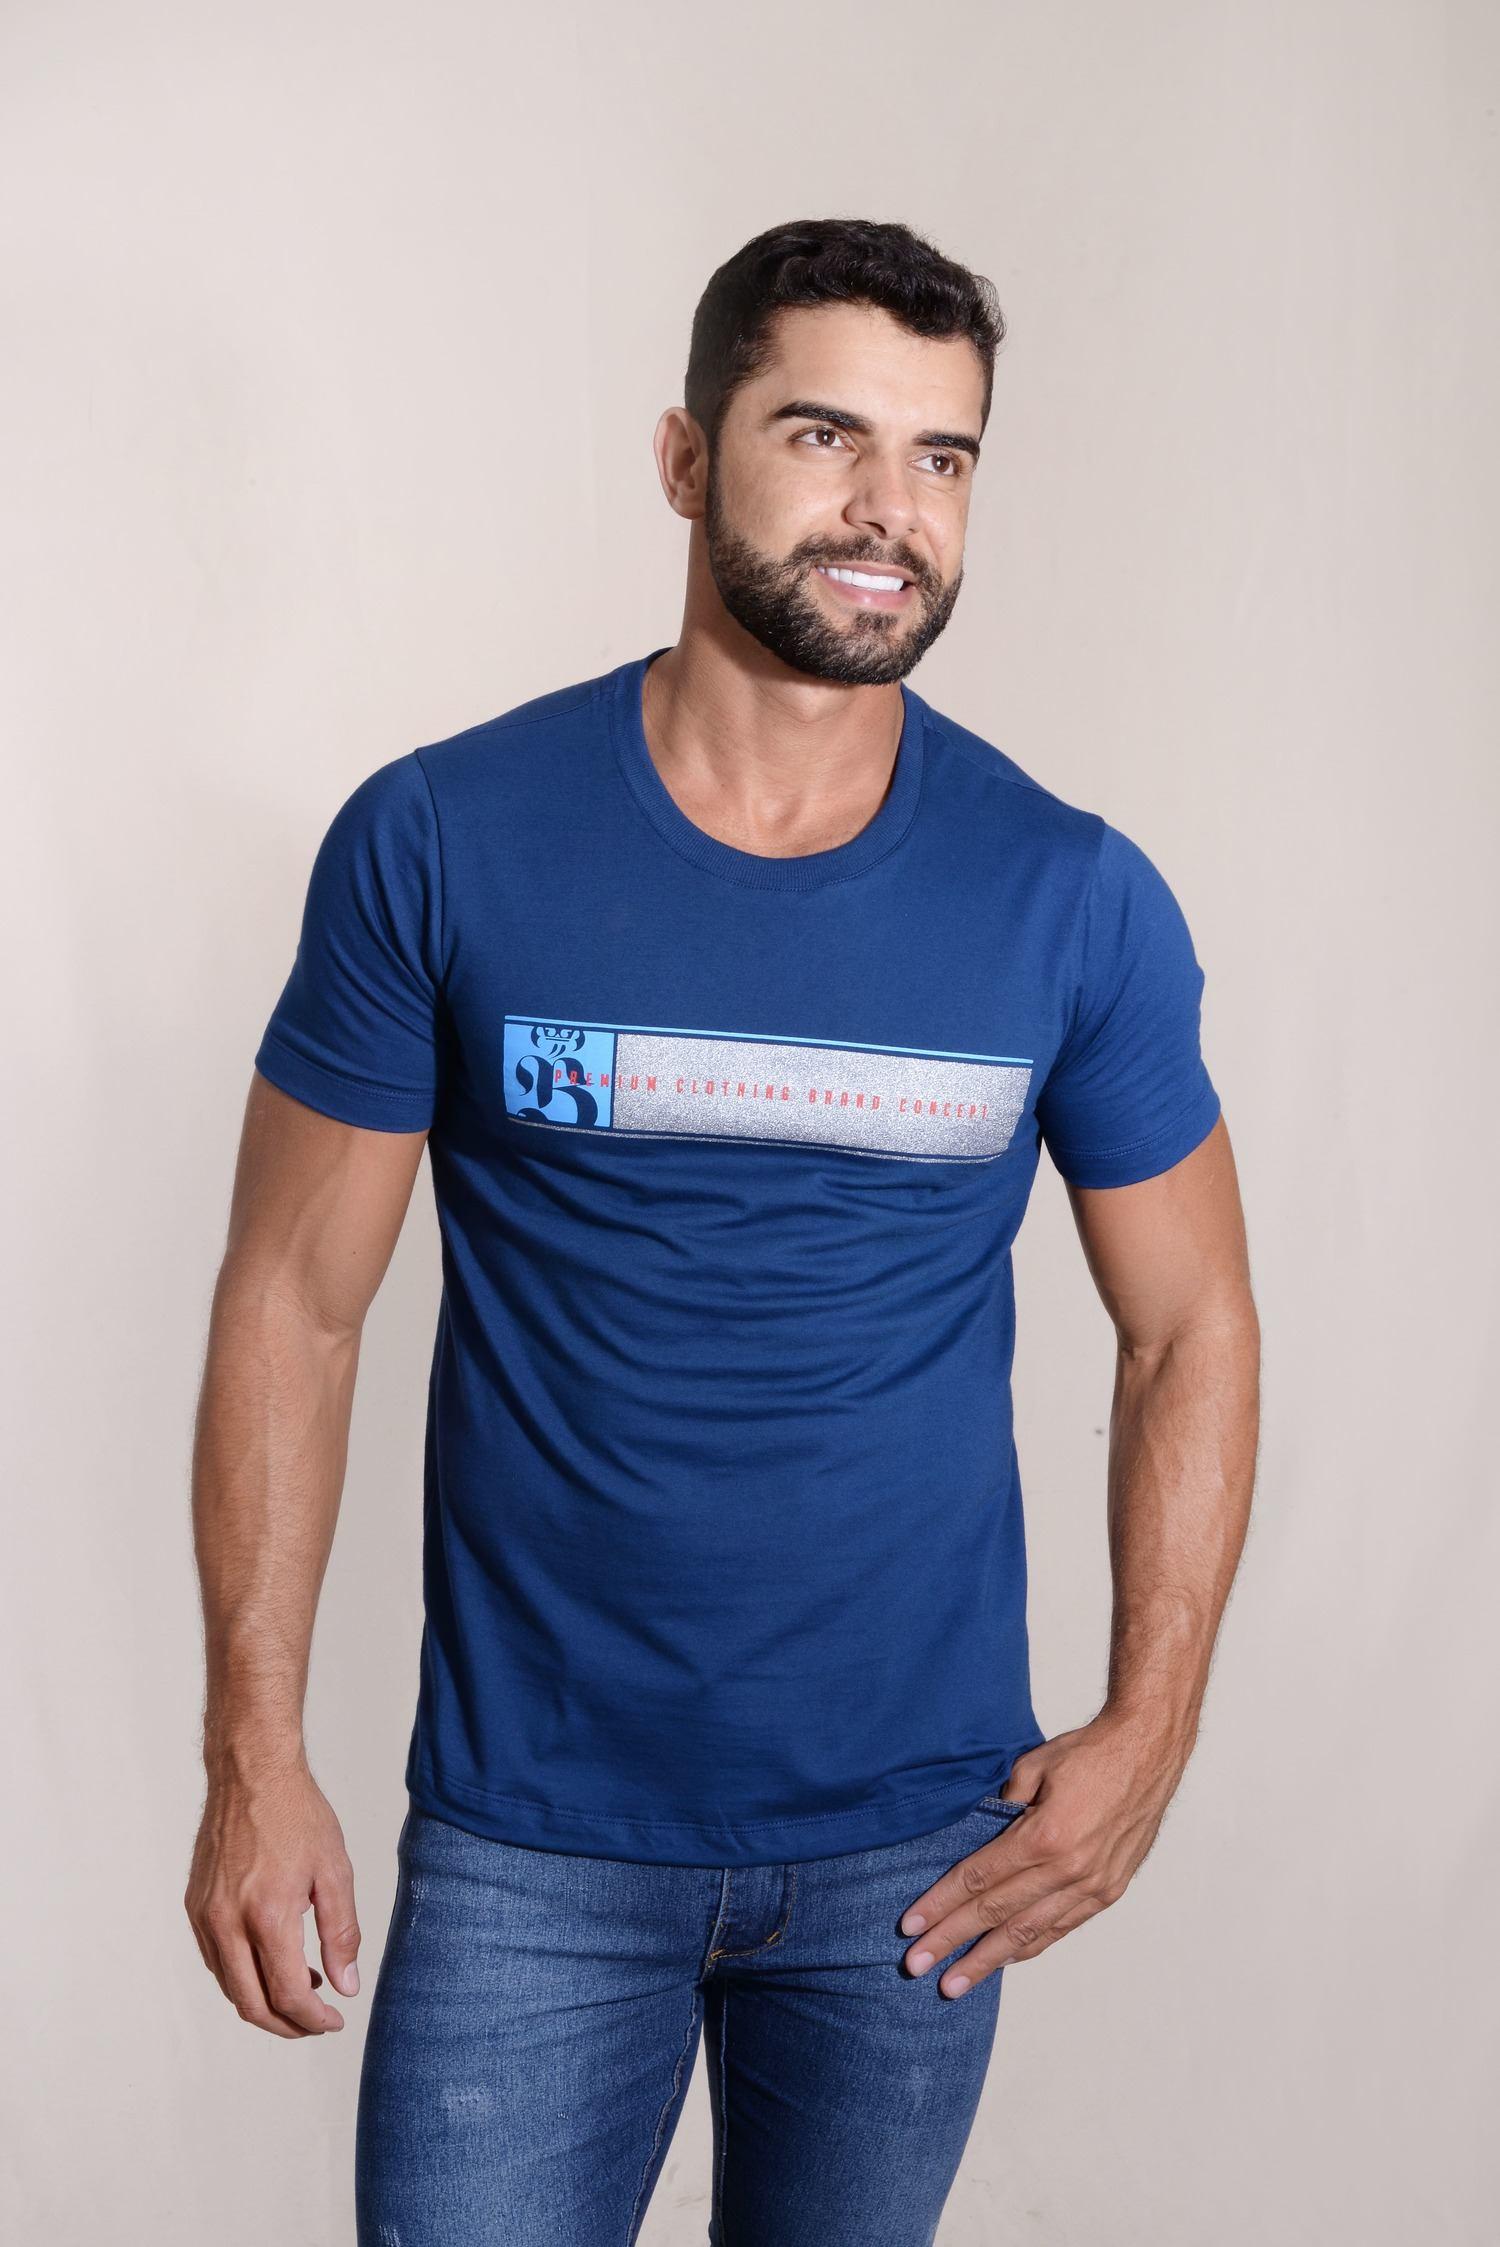 Camiseta Premium Clothing 100% Algodão Silkada Tinta Cromada Burguês